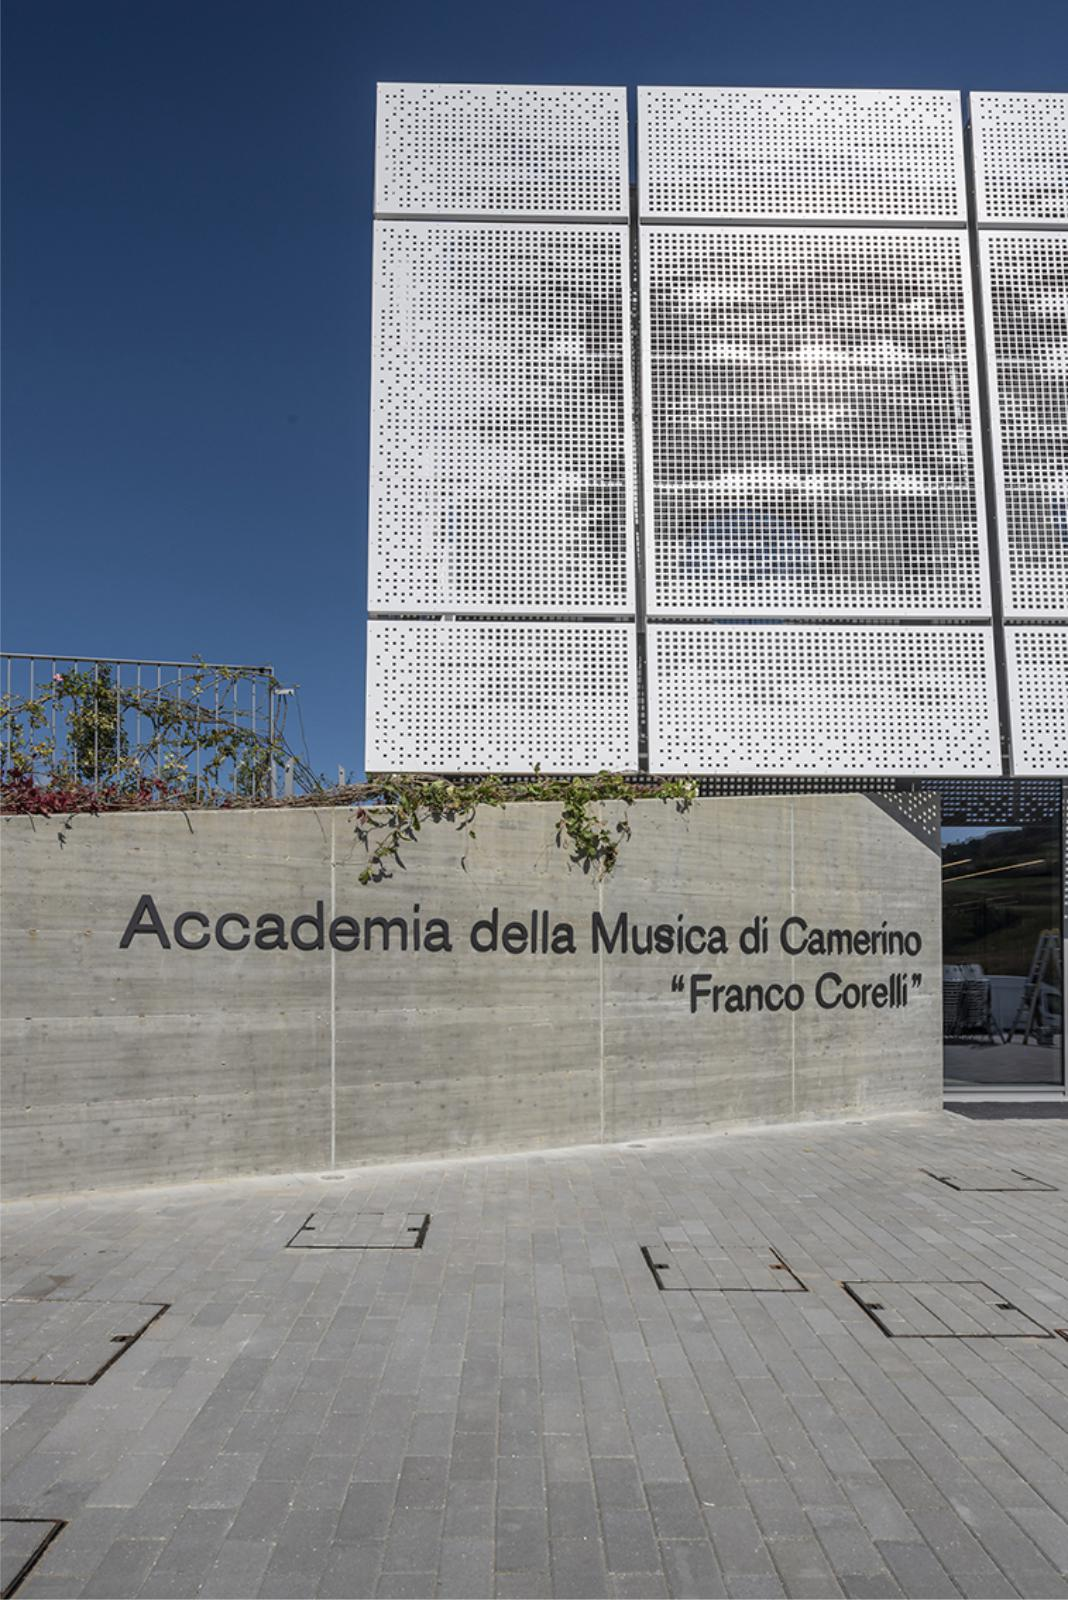 Camerino Academy of Music